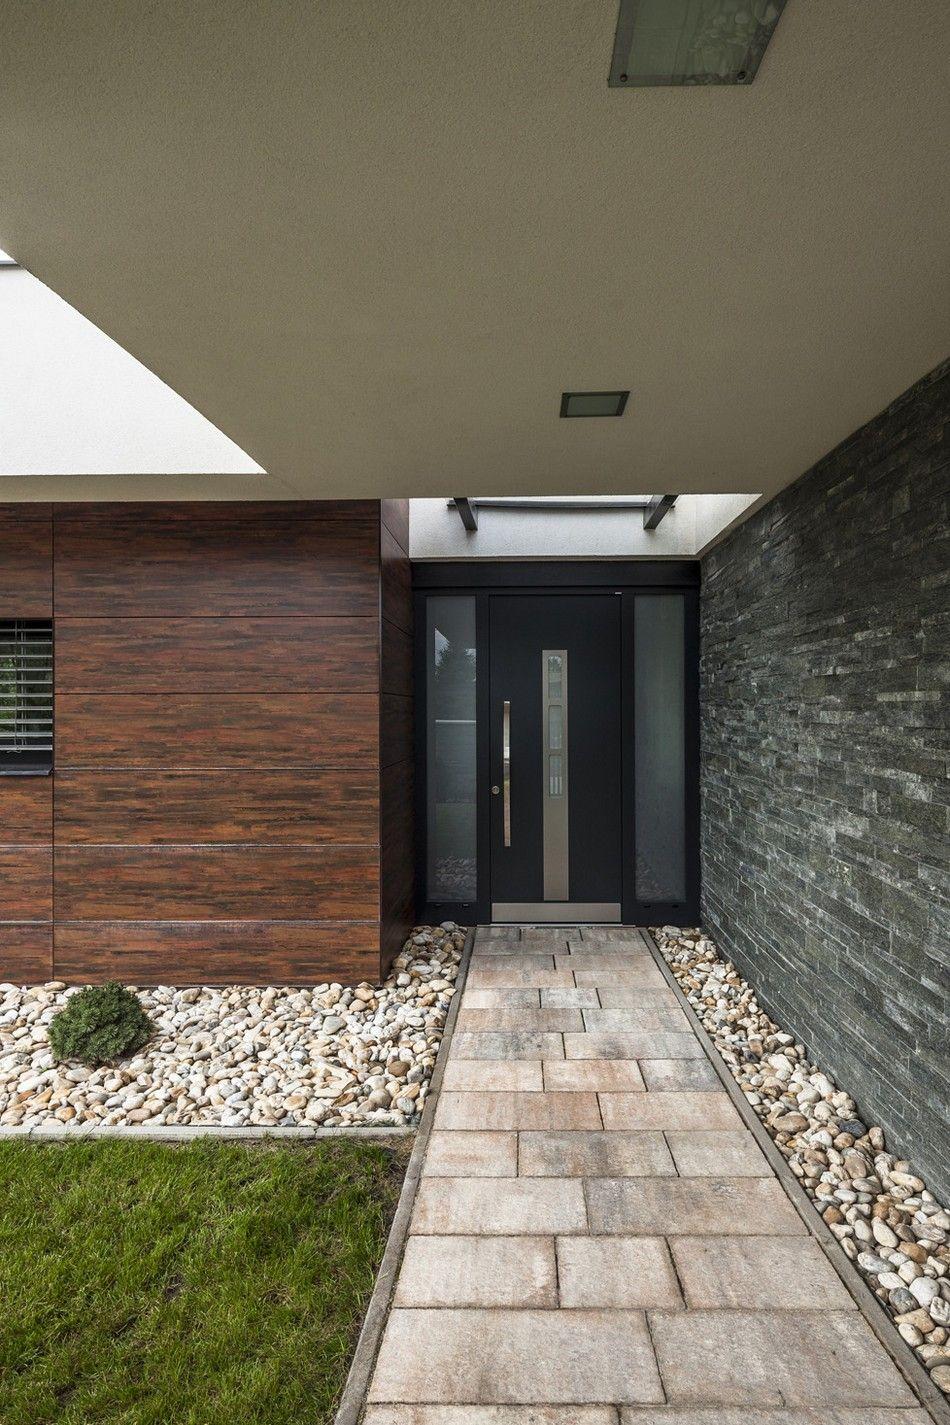 Ingresso Casa Esterno In Pietra modern residence in hungary oriented towards a garden pond